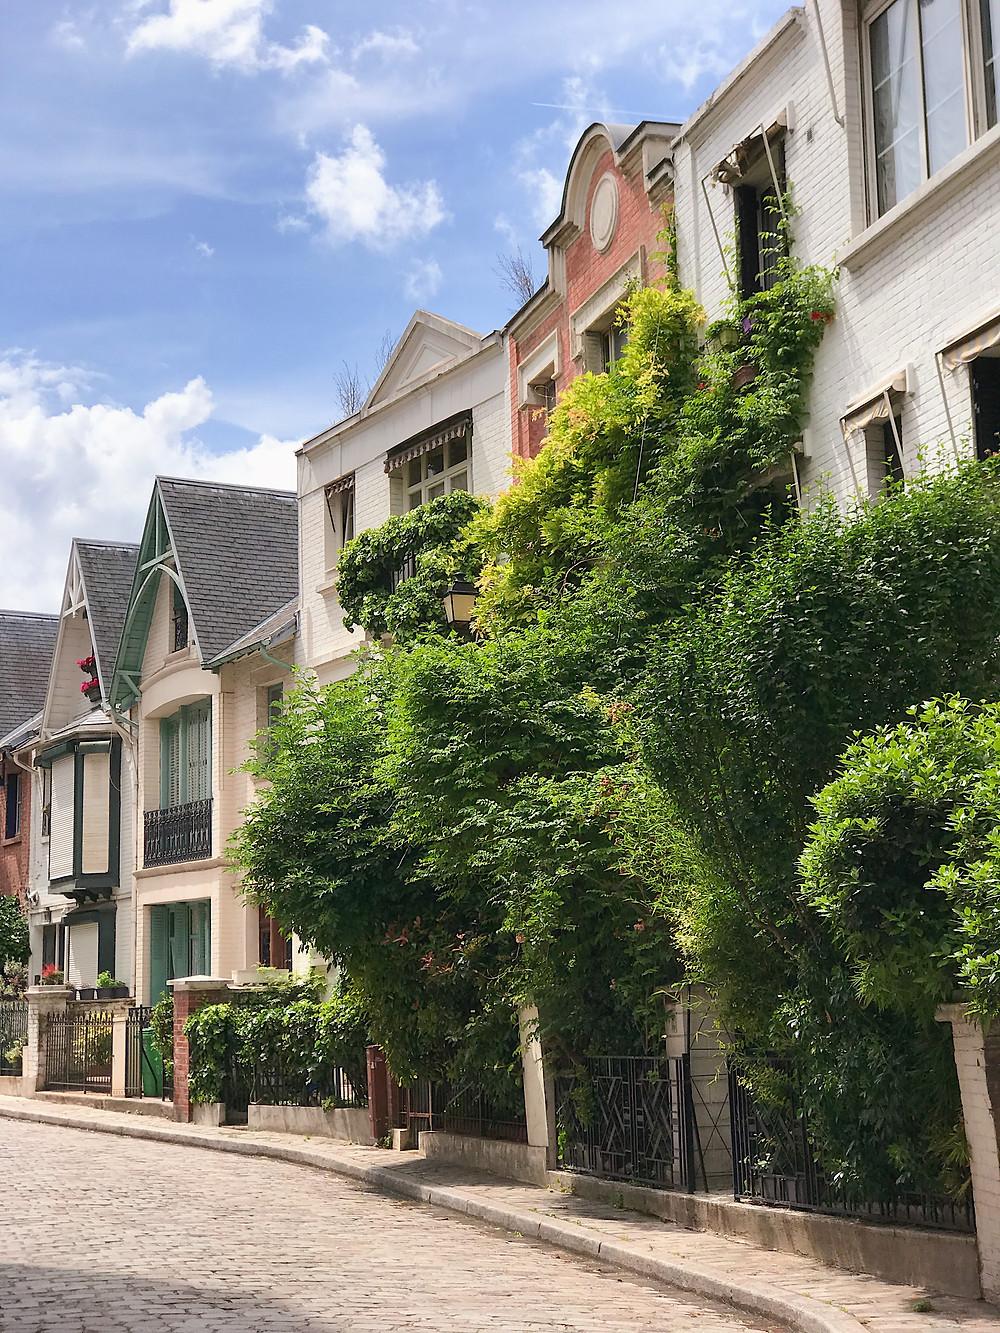 Parisienne row houses